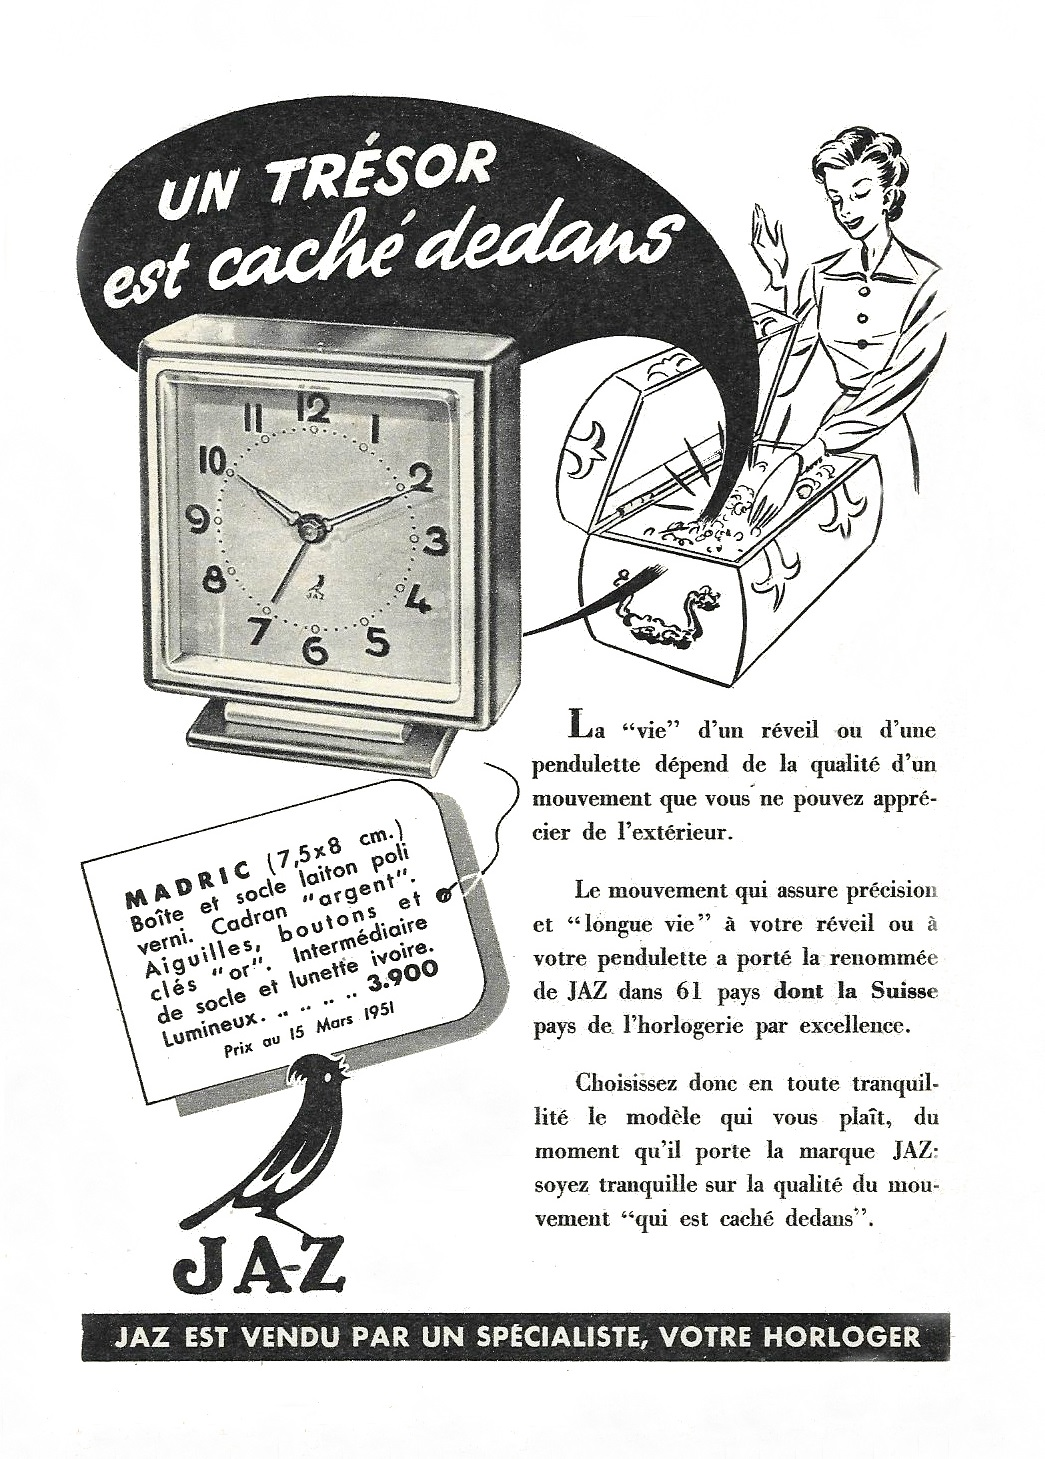 pub-jaz-madric-1951-1953